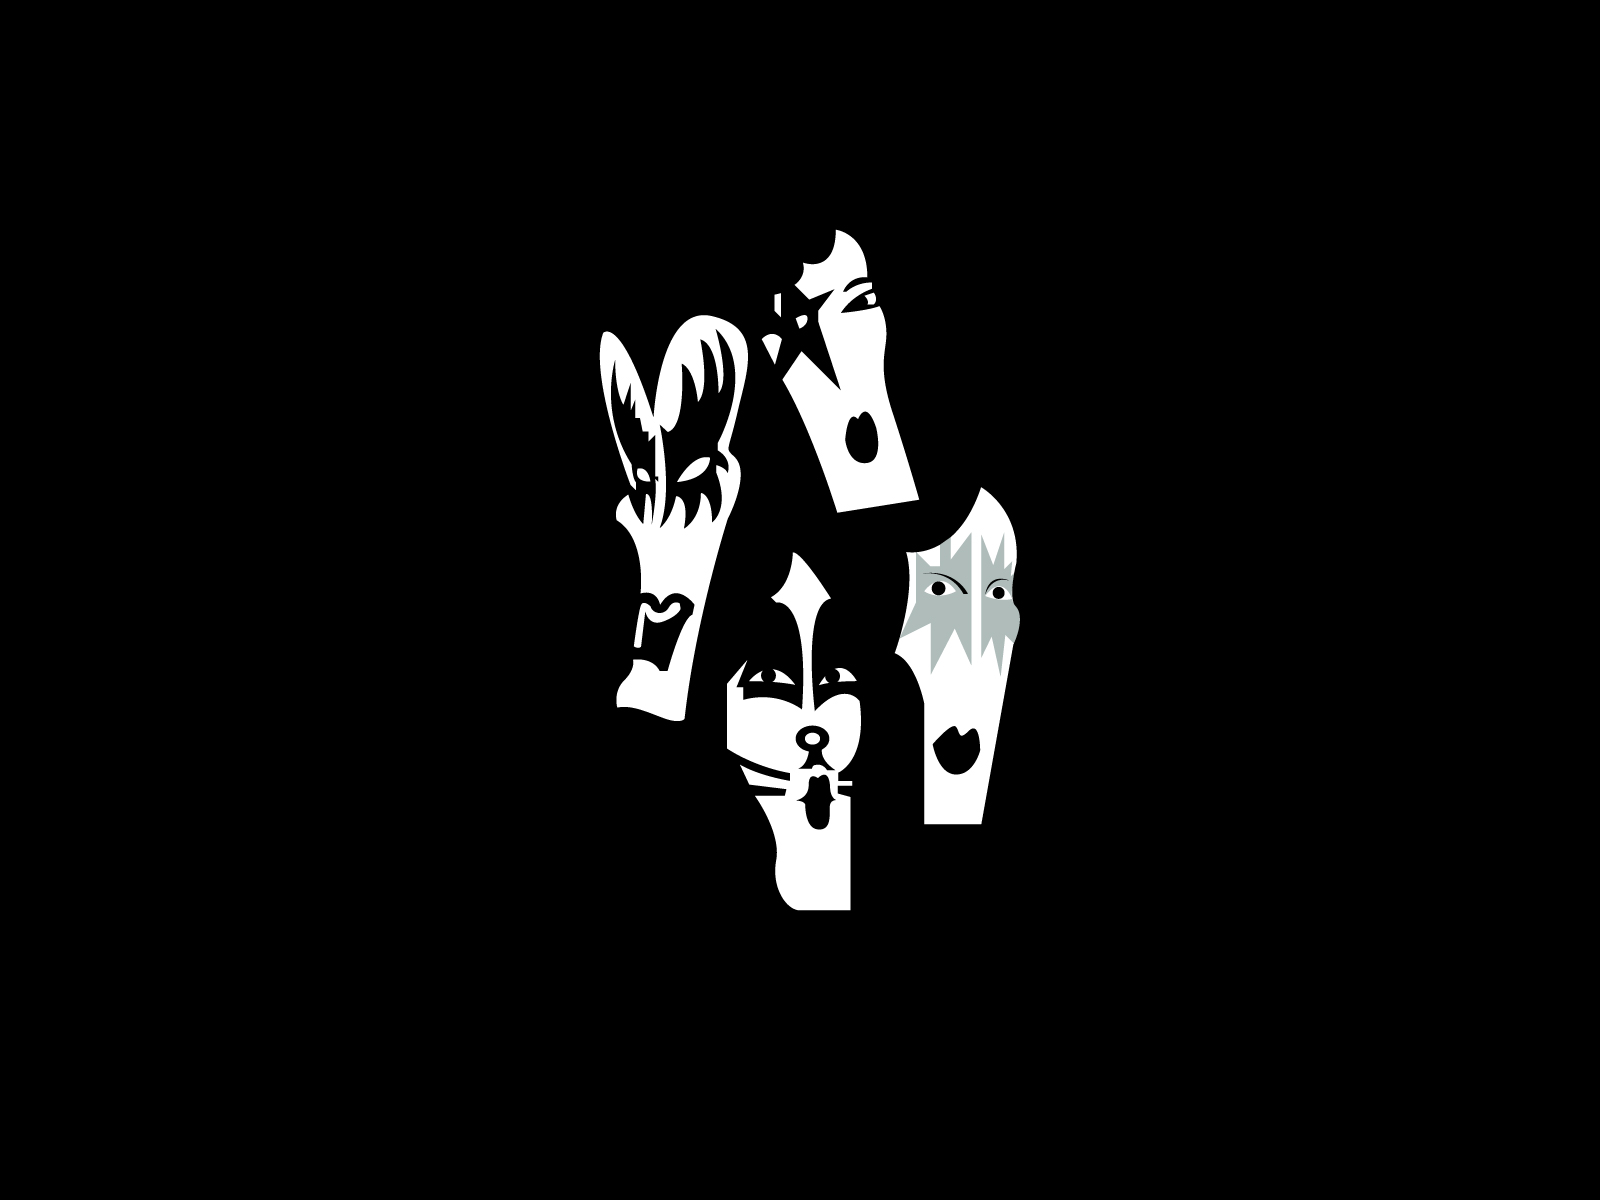 ... logos - Rock band logos, metal bands logos, punk bands logos | Page 2